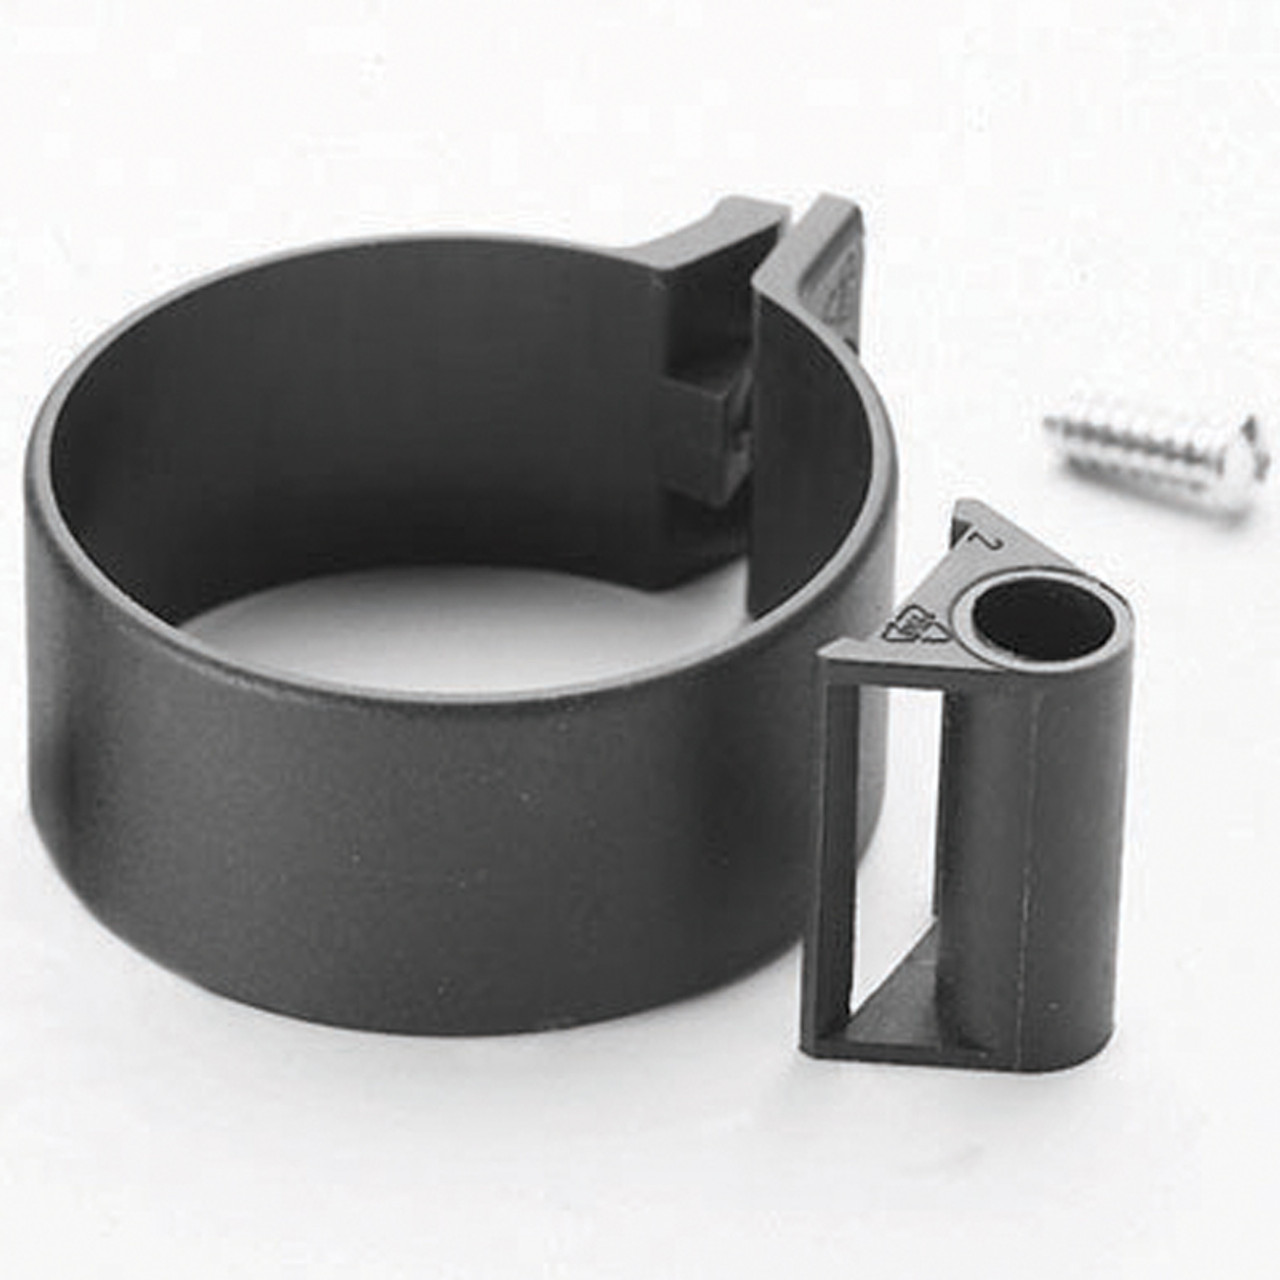 Modesty Panel Clip Belt and Connector - replacementtablelegs.com